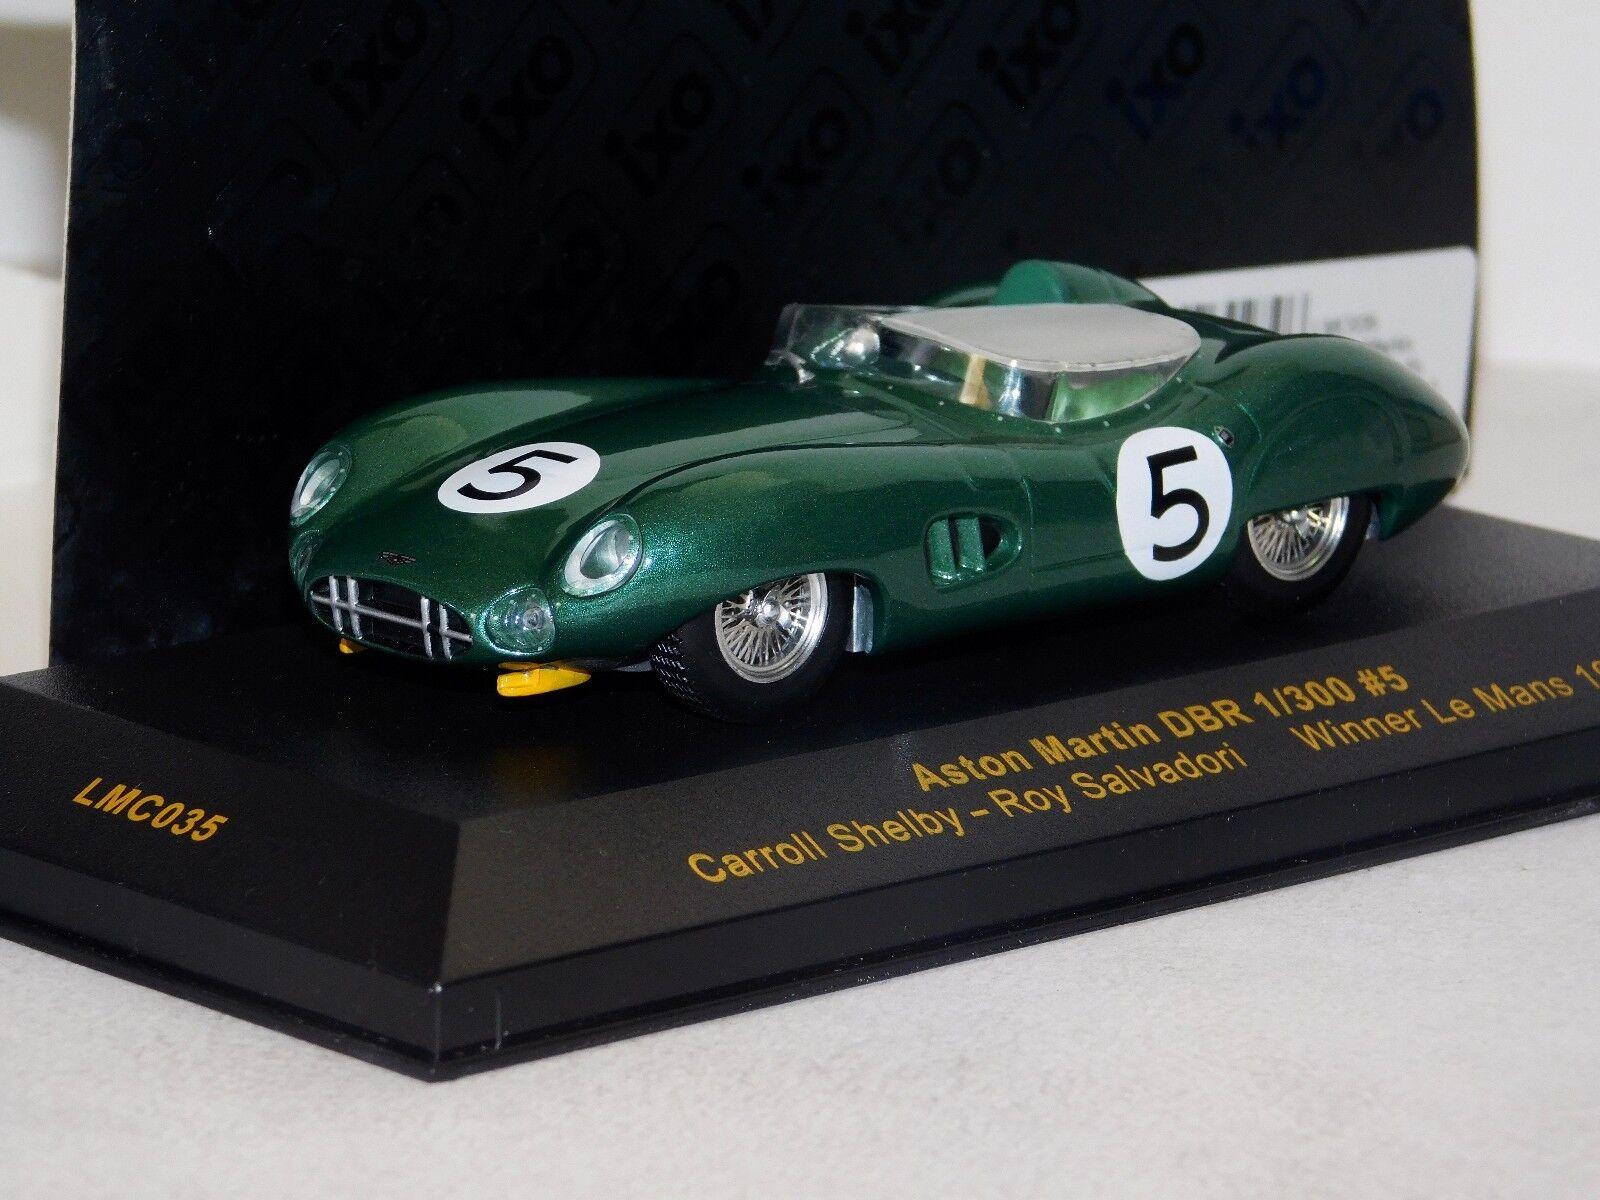 Aston Martin    5 C. Shelby R. profesionales le Mans 1959 IXO Lim. 1 300 LMC035 1 43 d91cb5